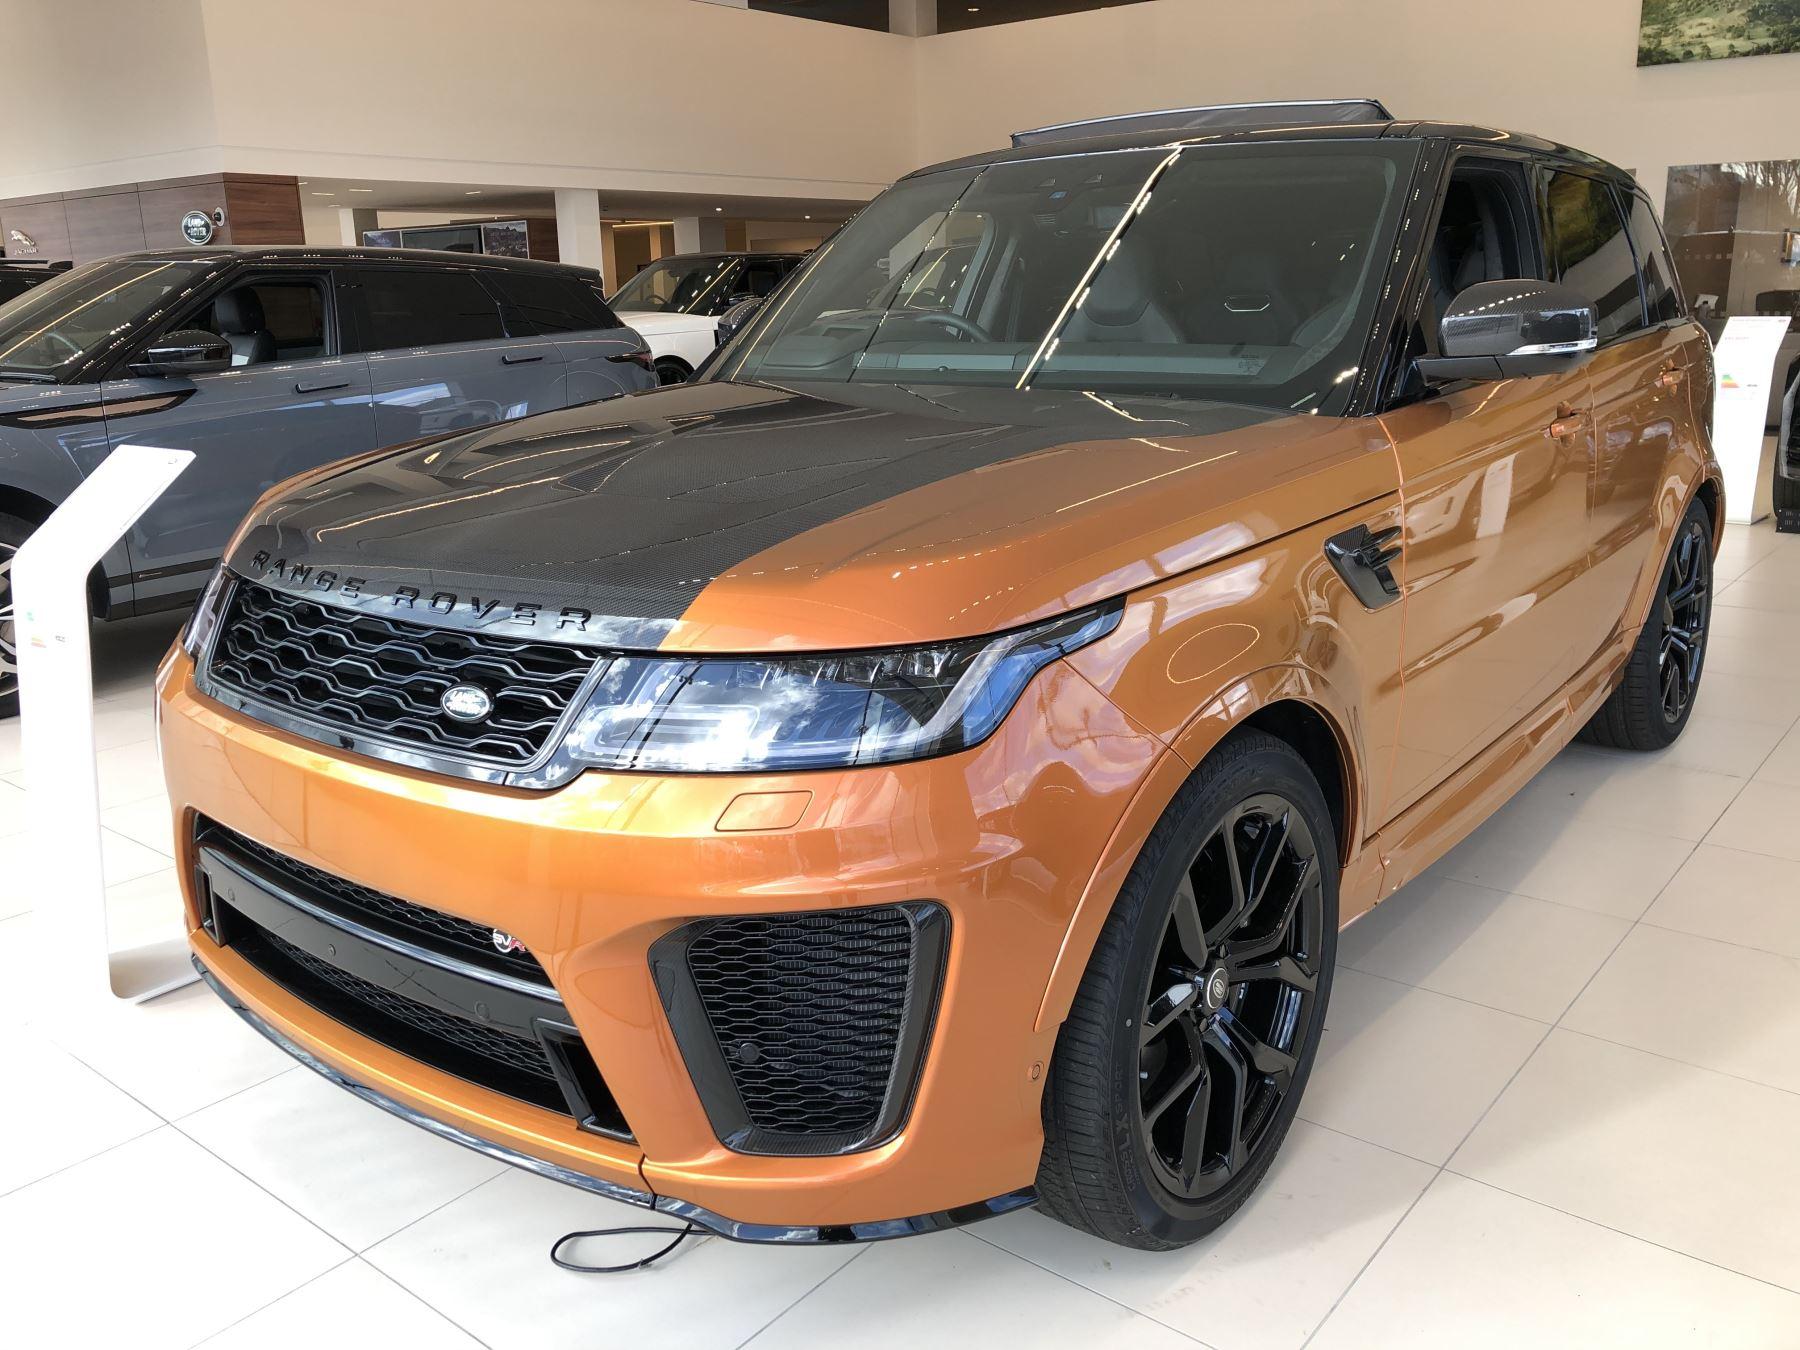 Land Rover Range Rover Sport 5.0 P575 S/C SVR image 1